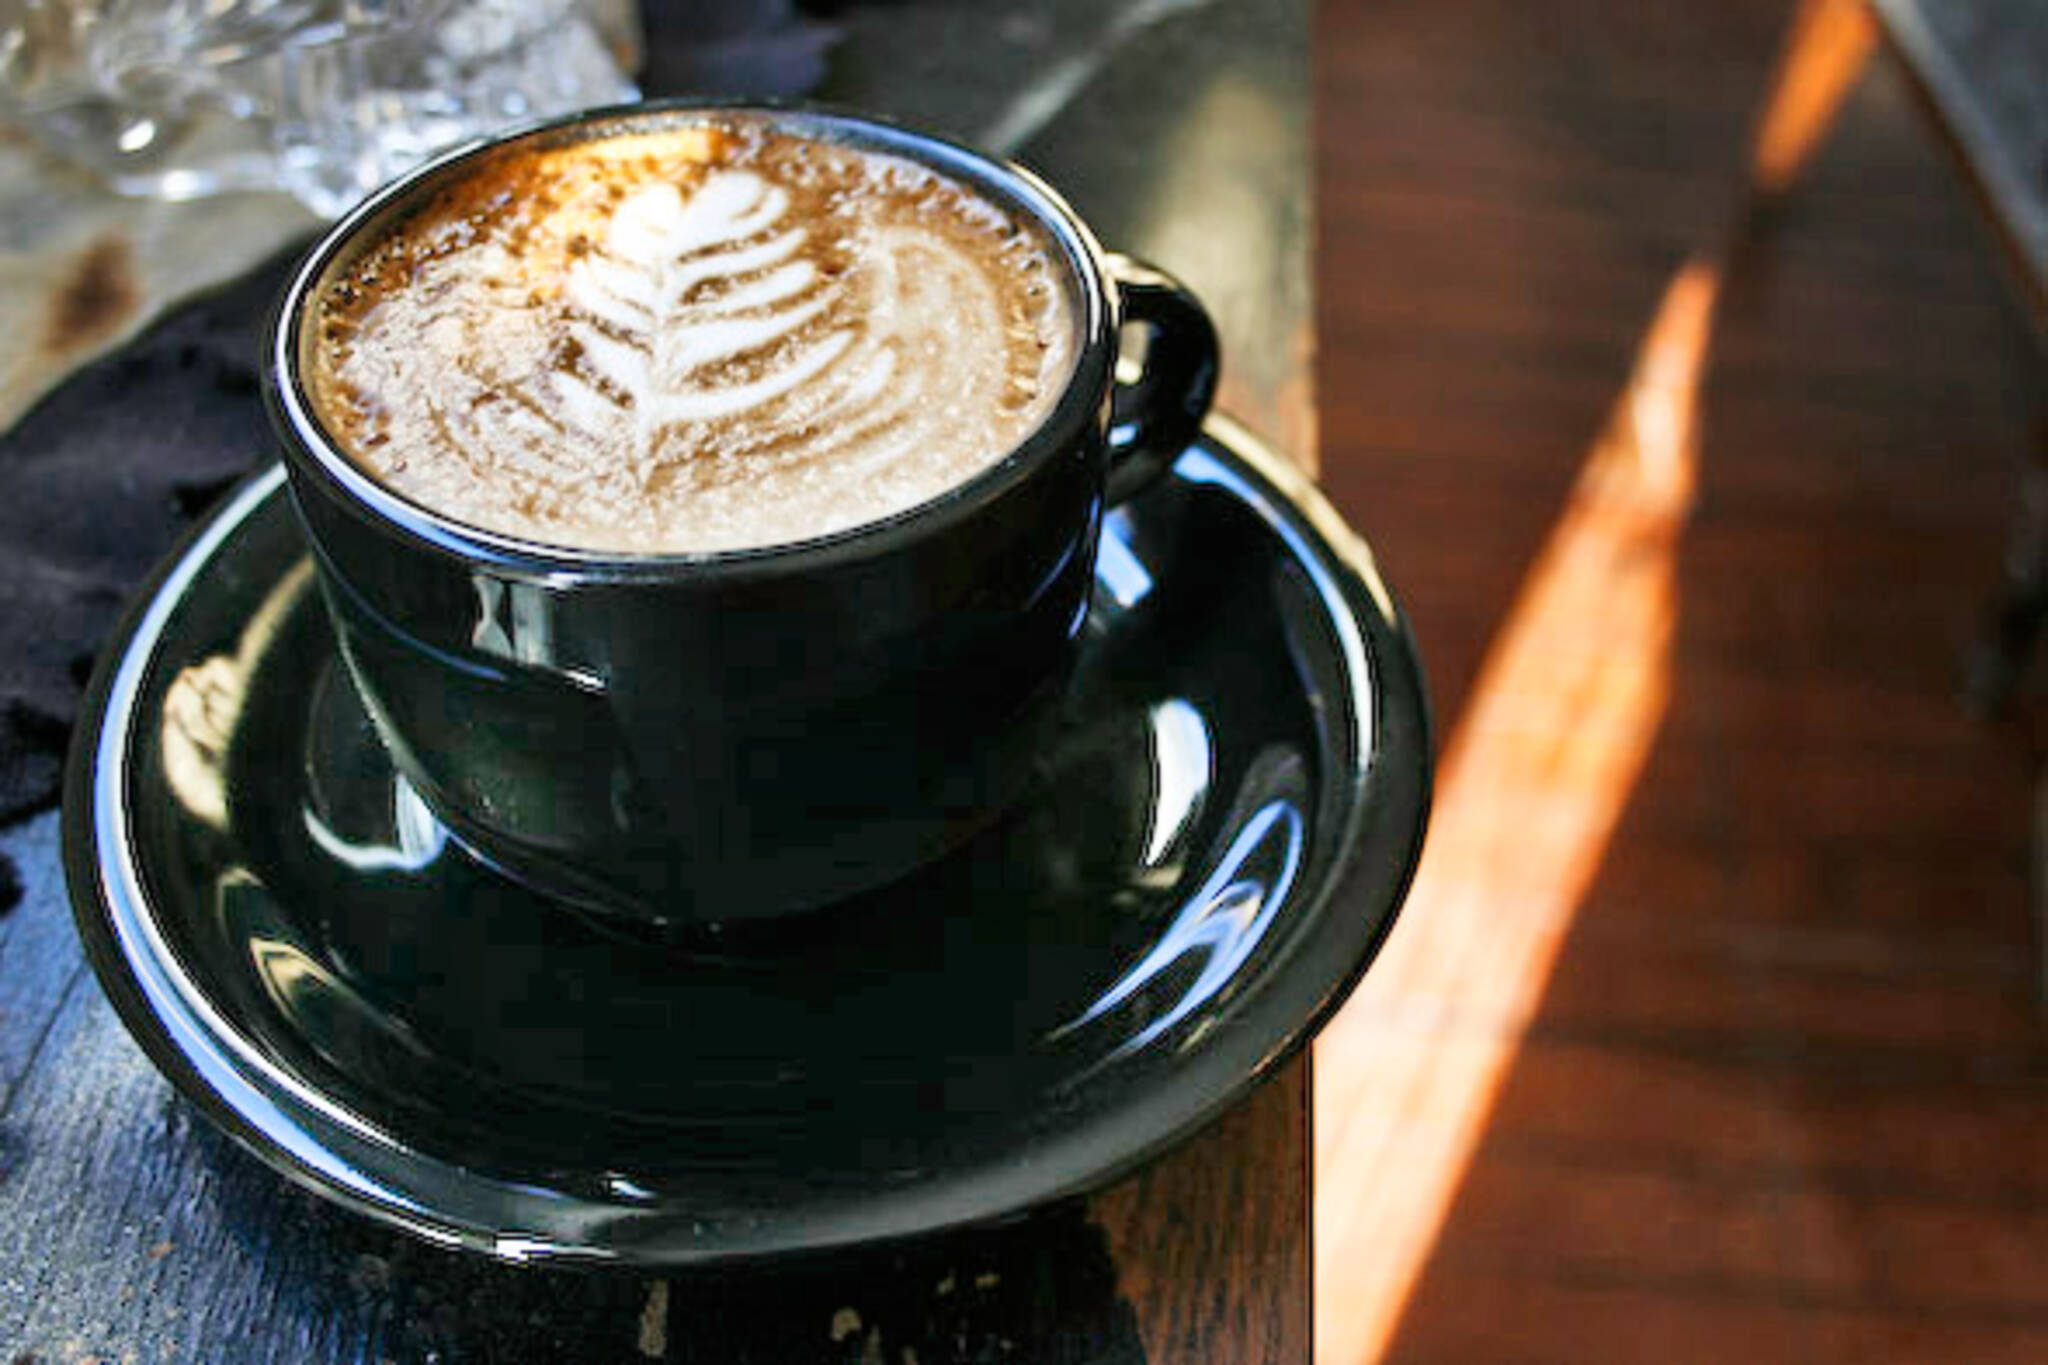 the Mascot cafe toronto